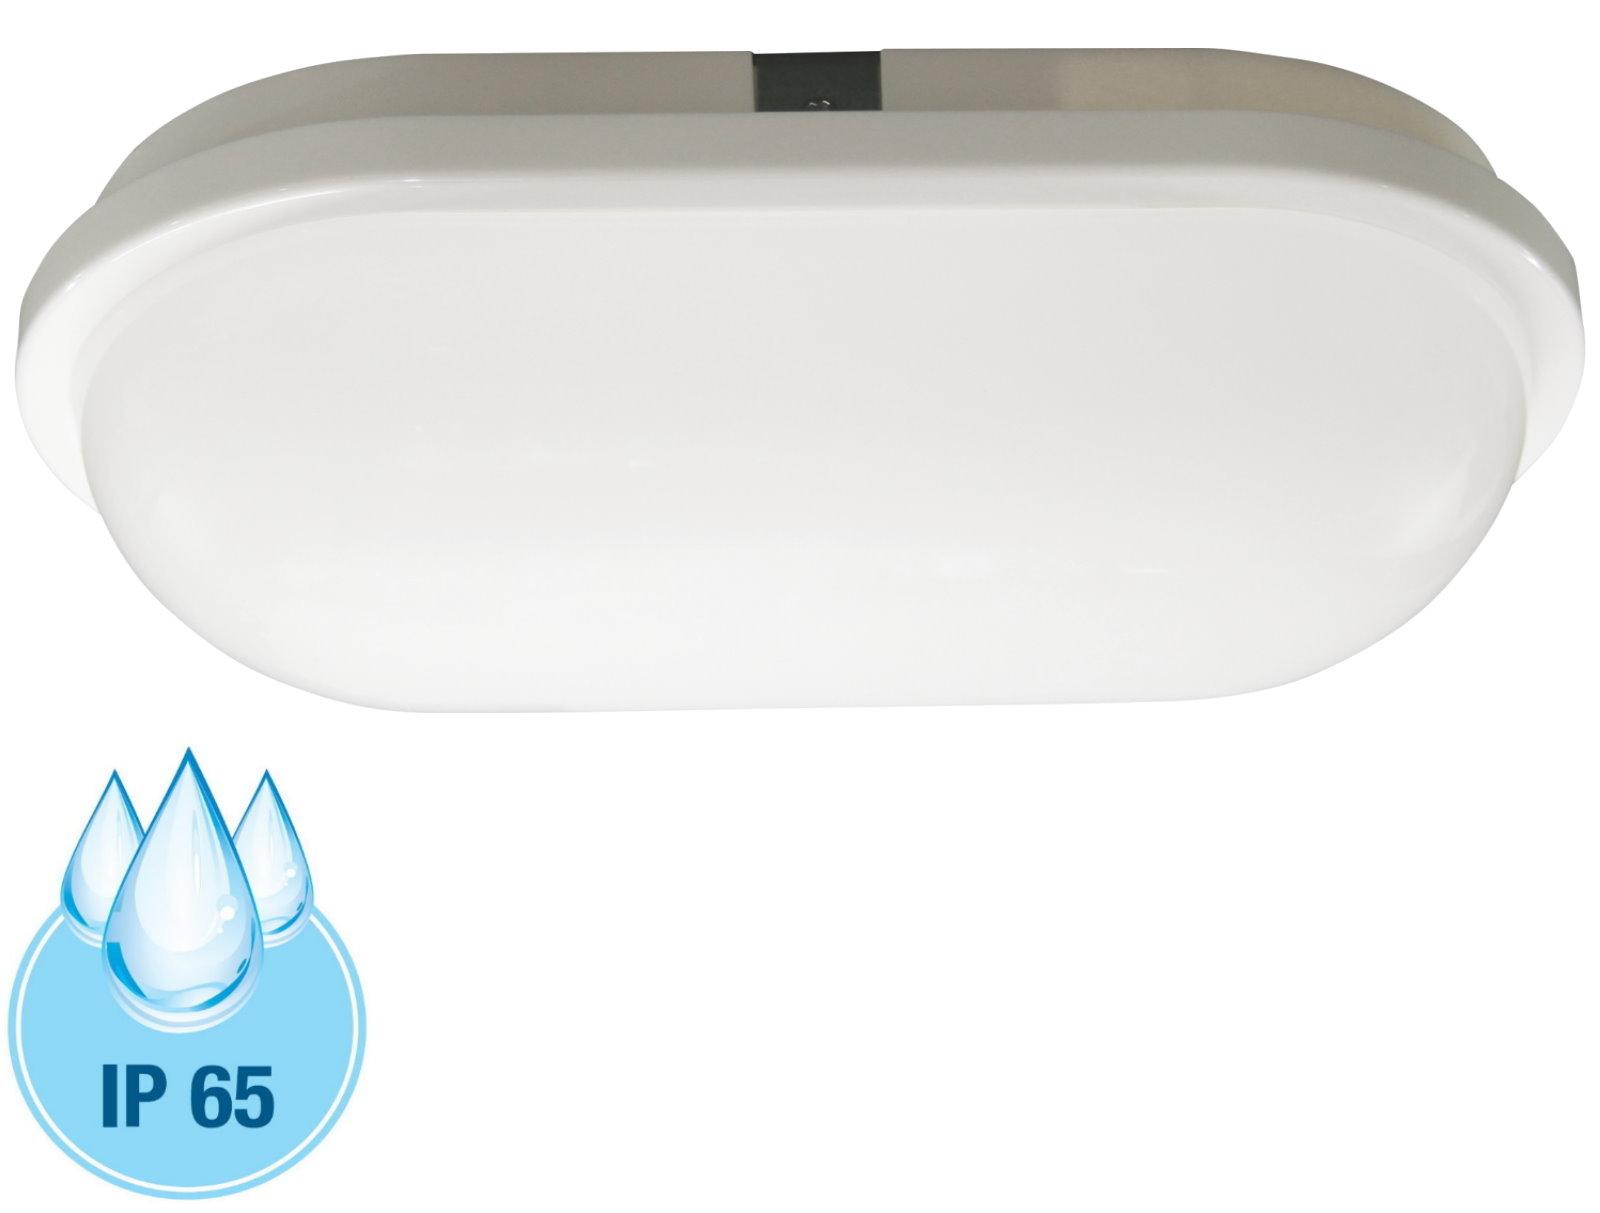 led 2in1 aluminium spiegelleuchte ip44 13w warmwei. Black Bedroom Furniture Sets. Home Design Ideas